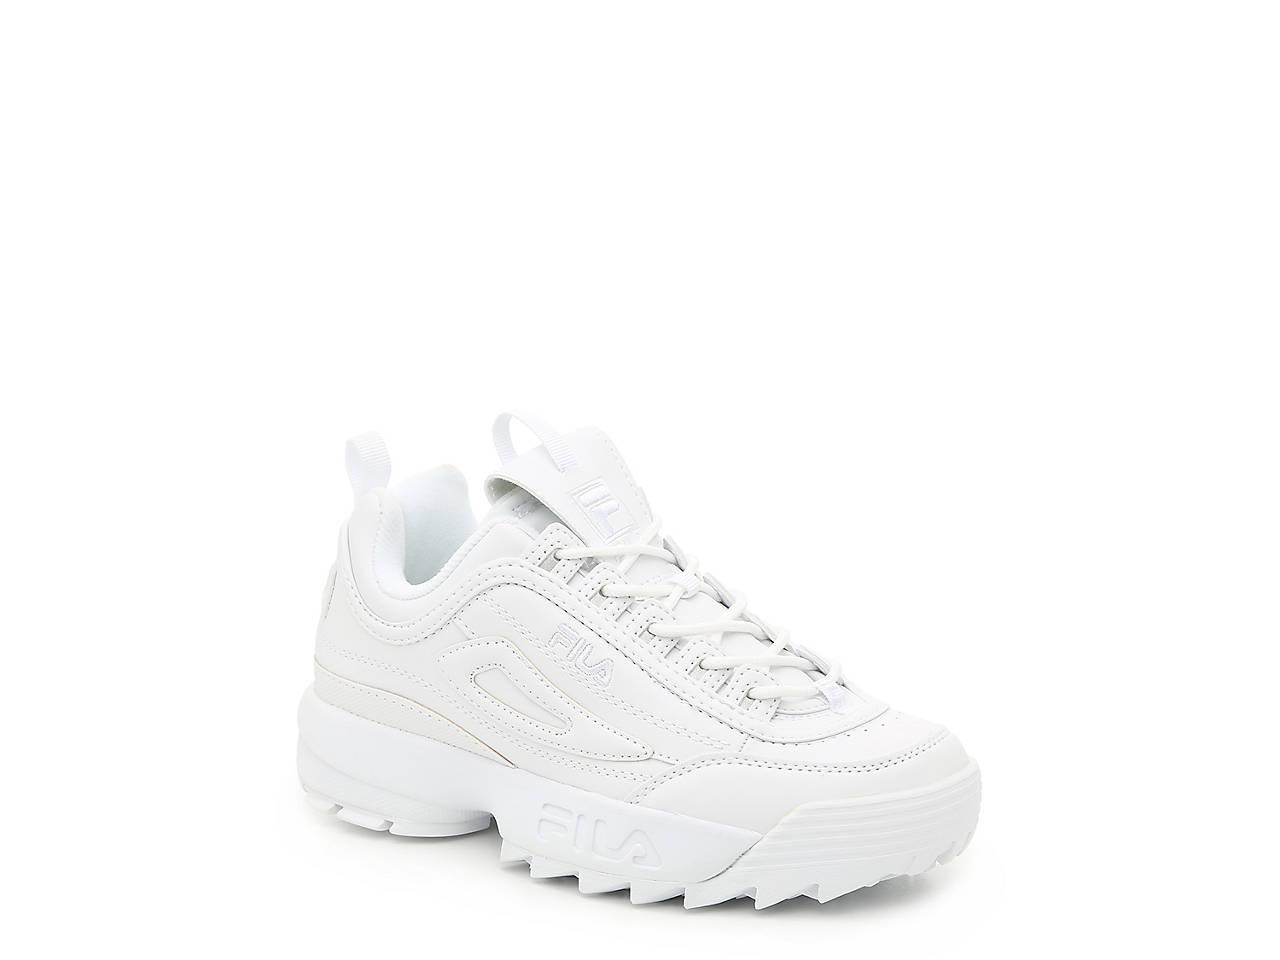 e13016c987cbf Fila Disruptor II Toddler & Youth Sneaker Kids Shoes | DSW